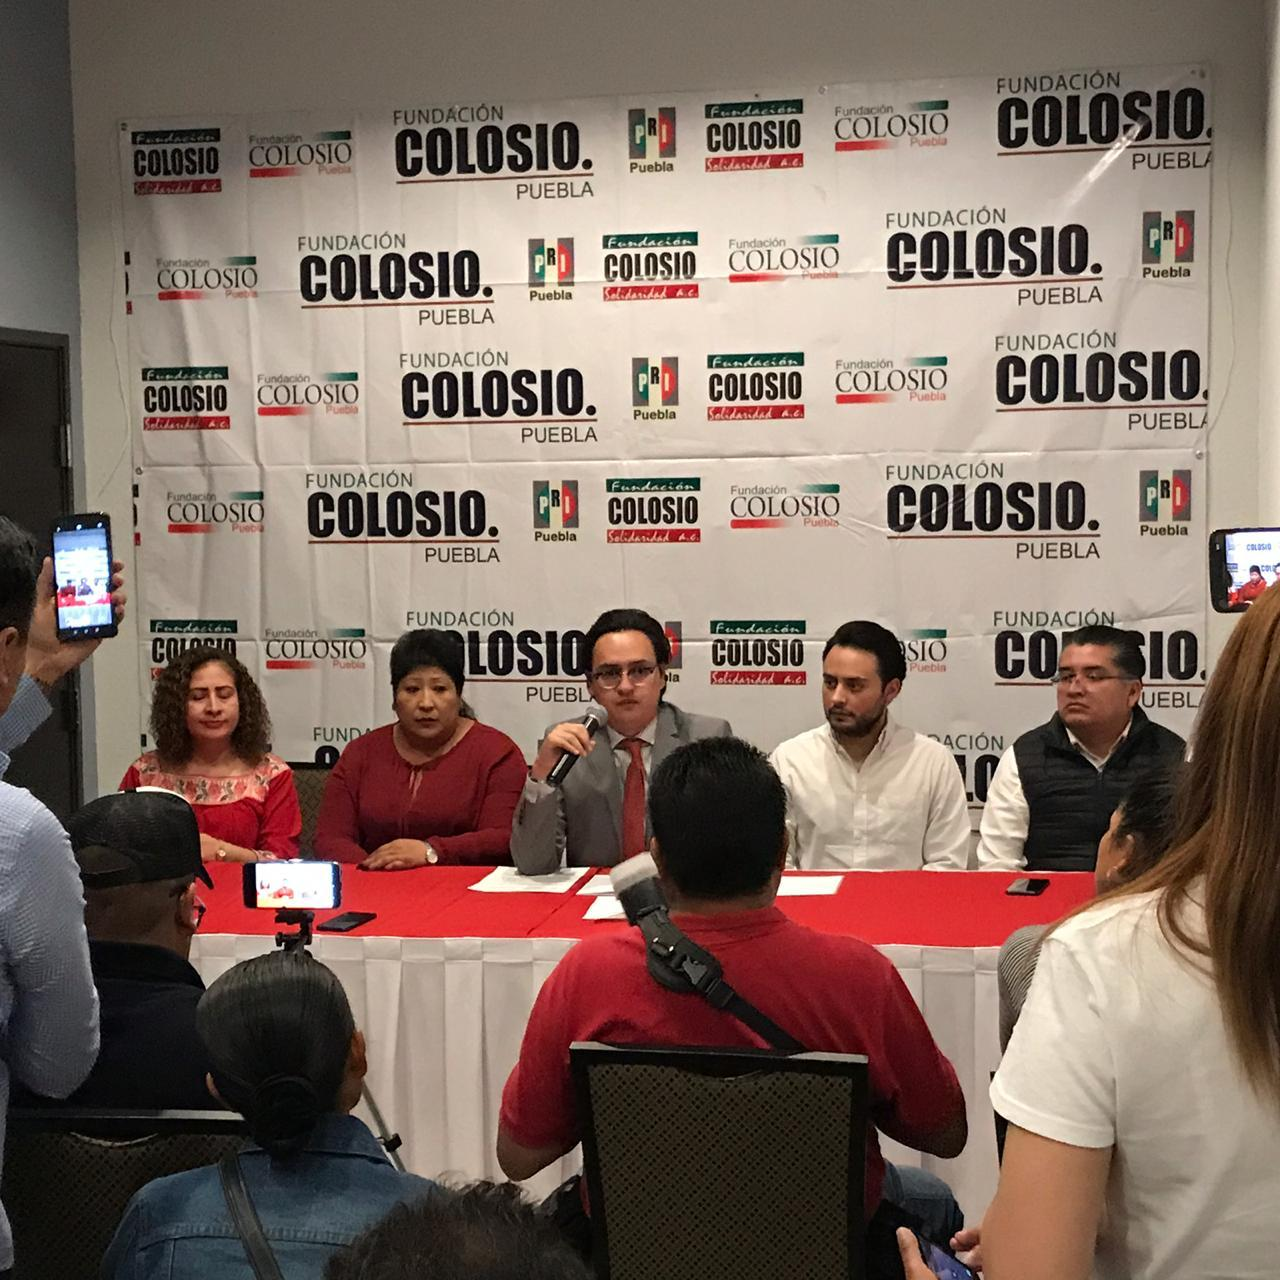 REFORZARÁN FOROS DE FUNDACIÓN COLOSIO TRABAJO DE AJM